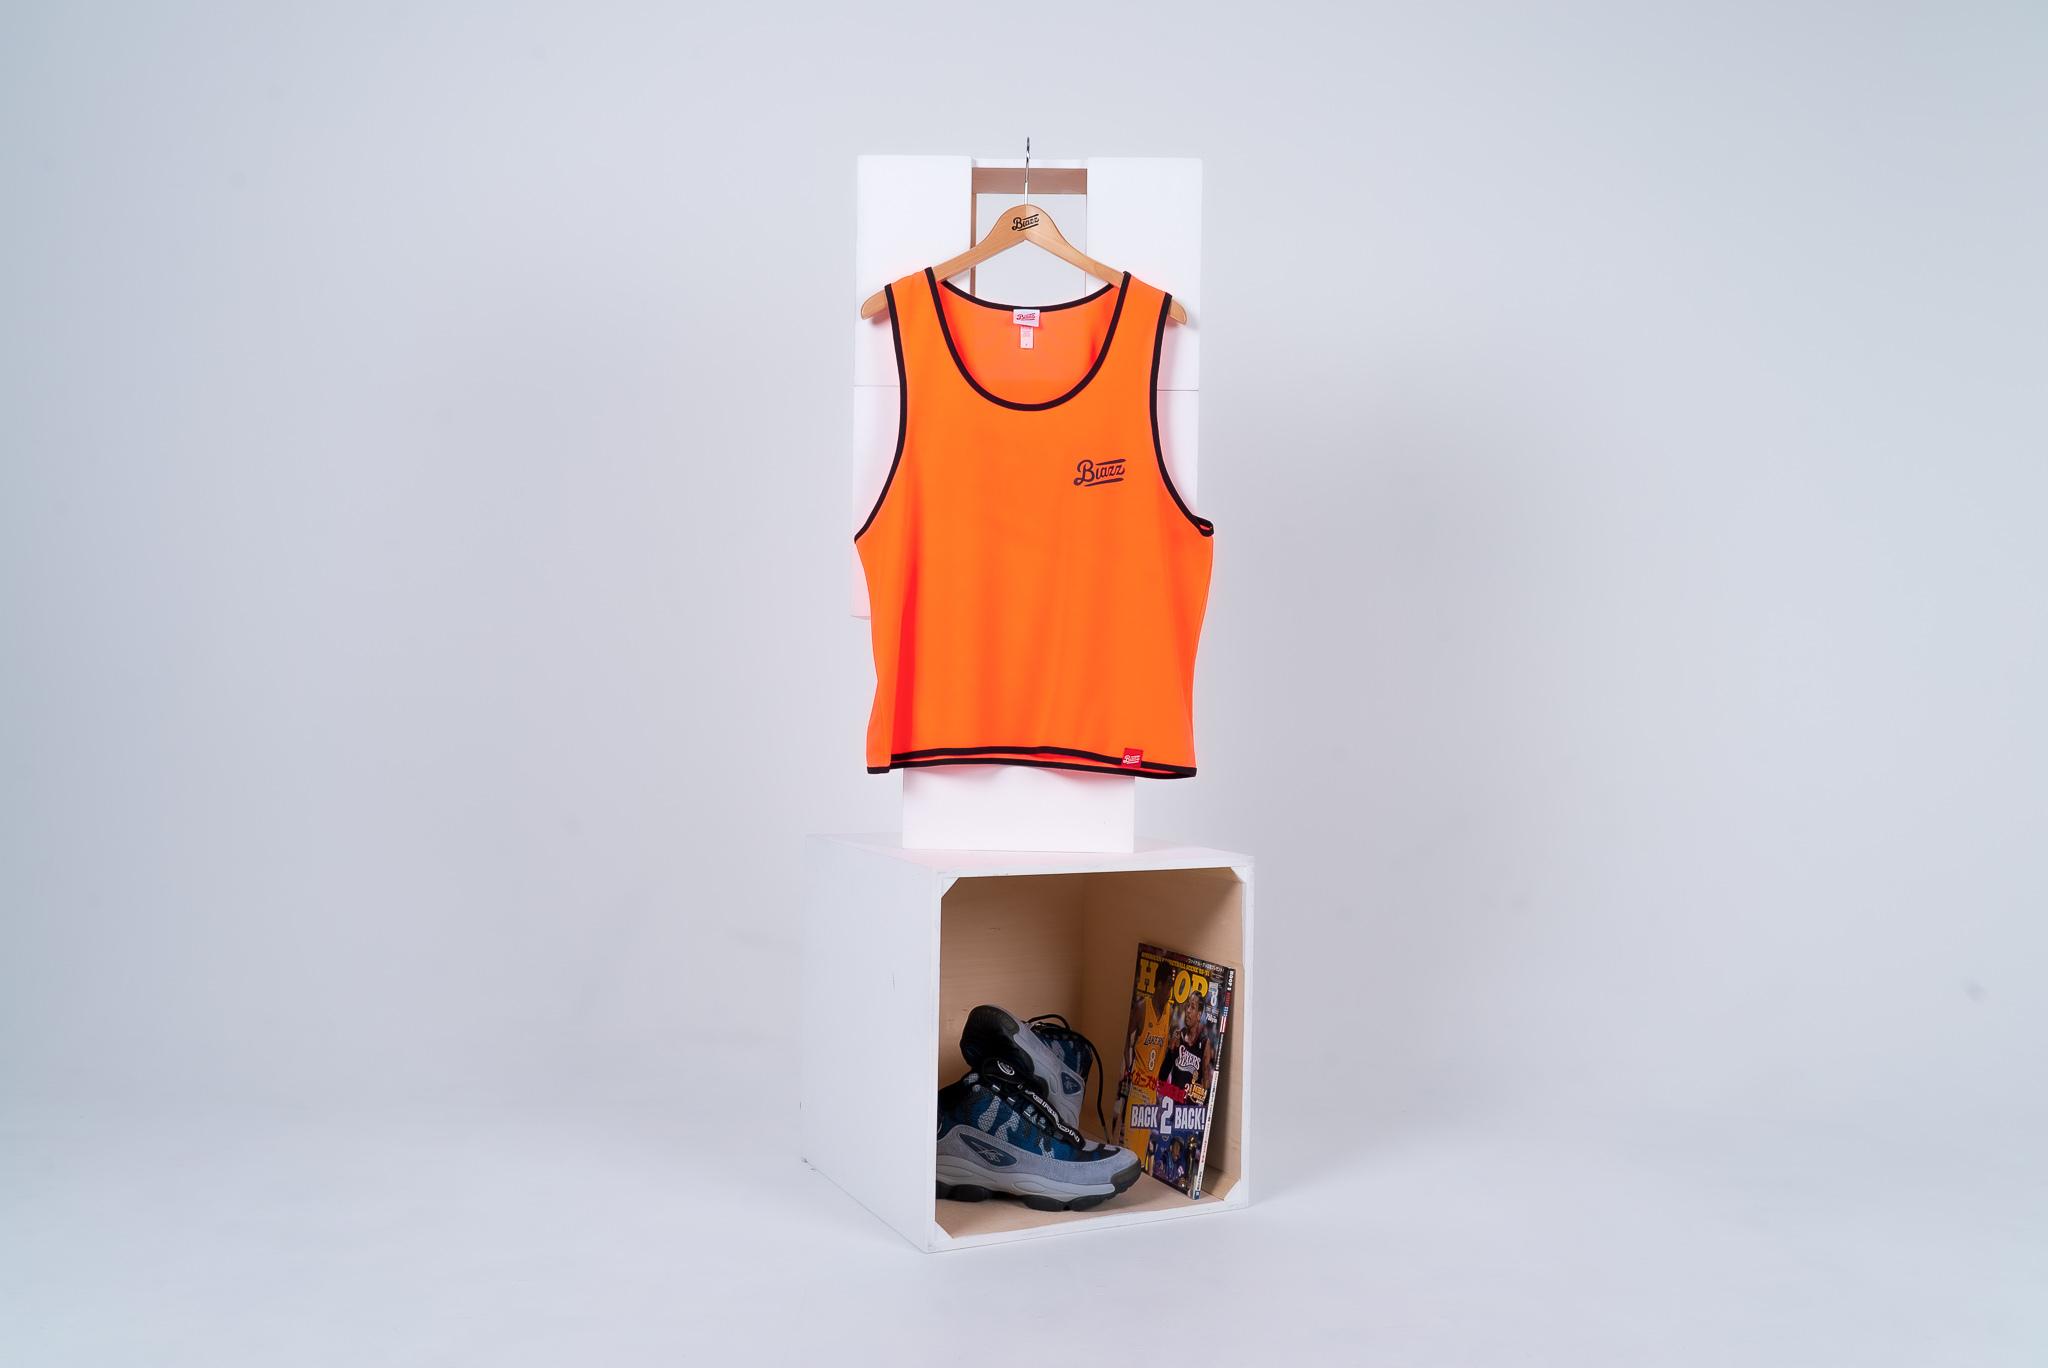 blazz sports bibs 5packs [NEON ORANGE]